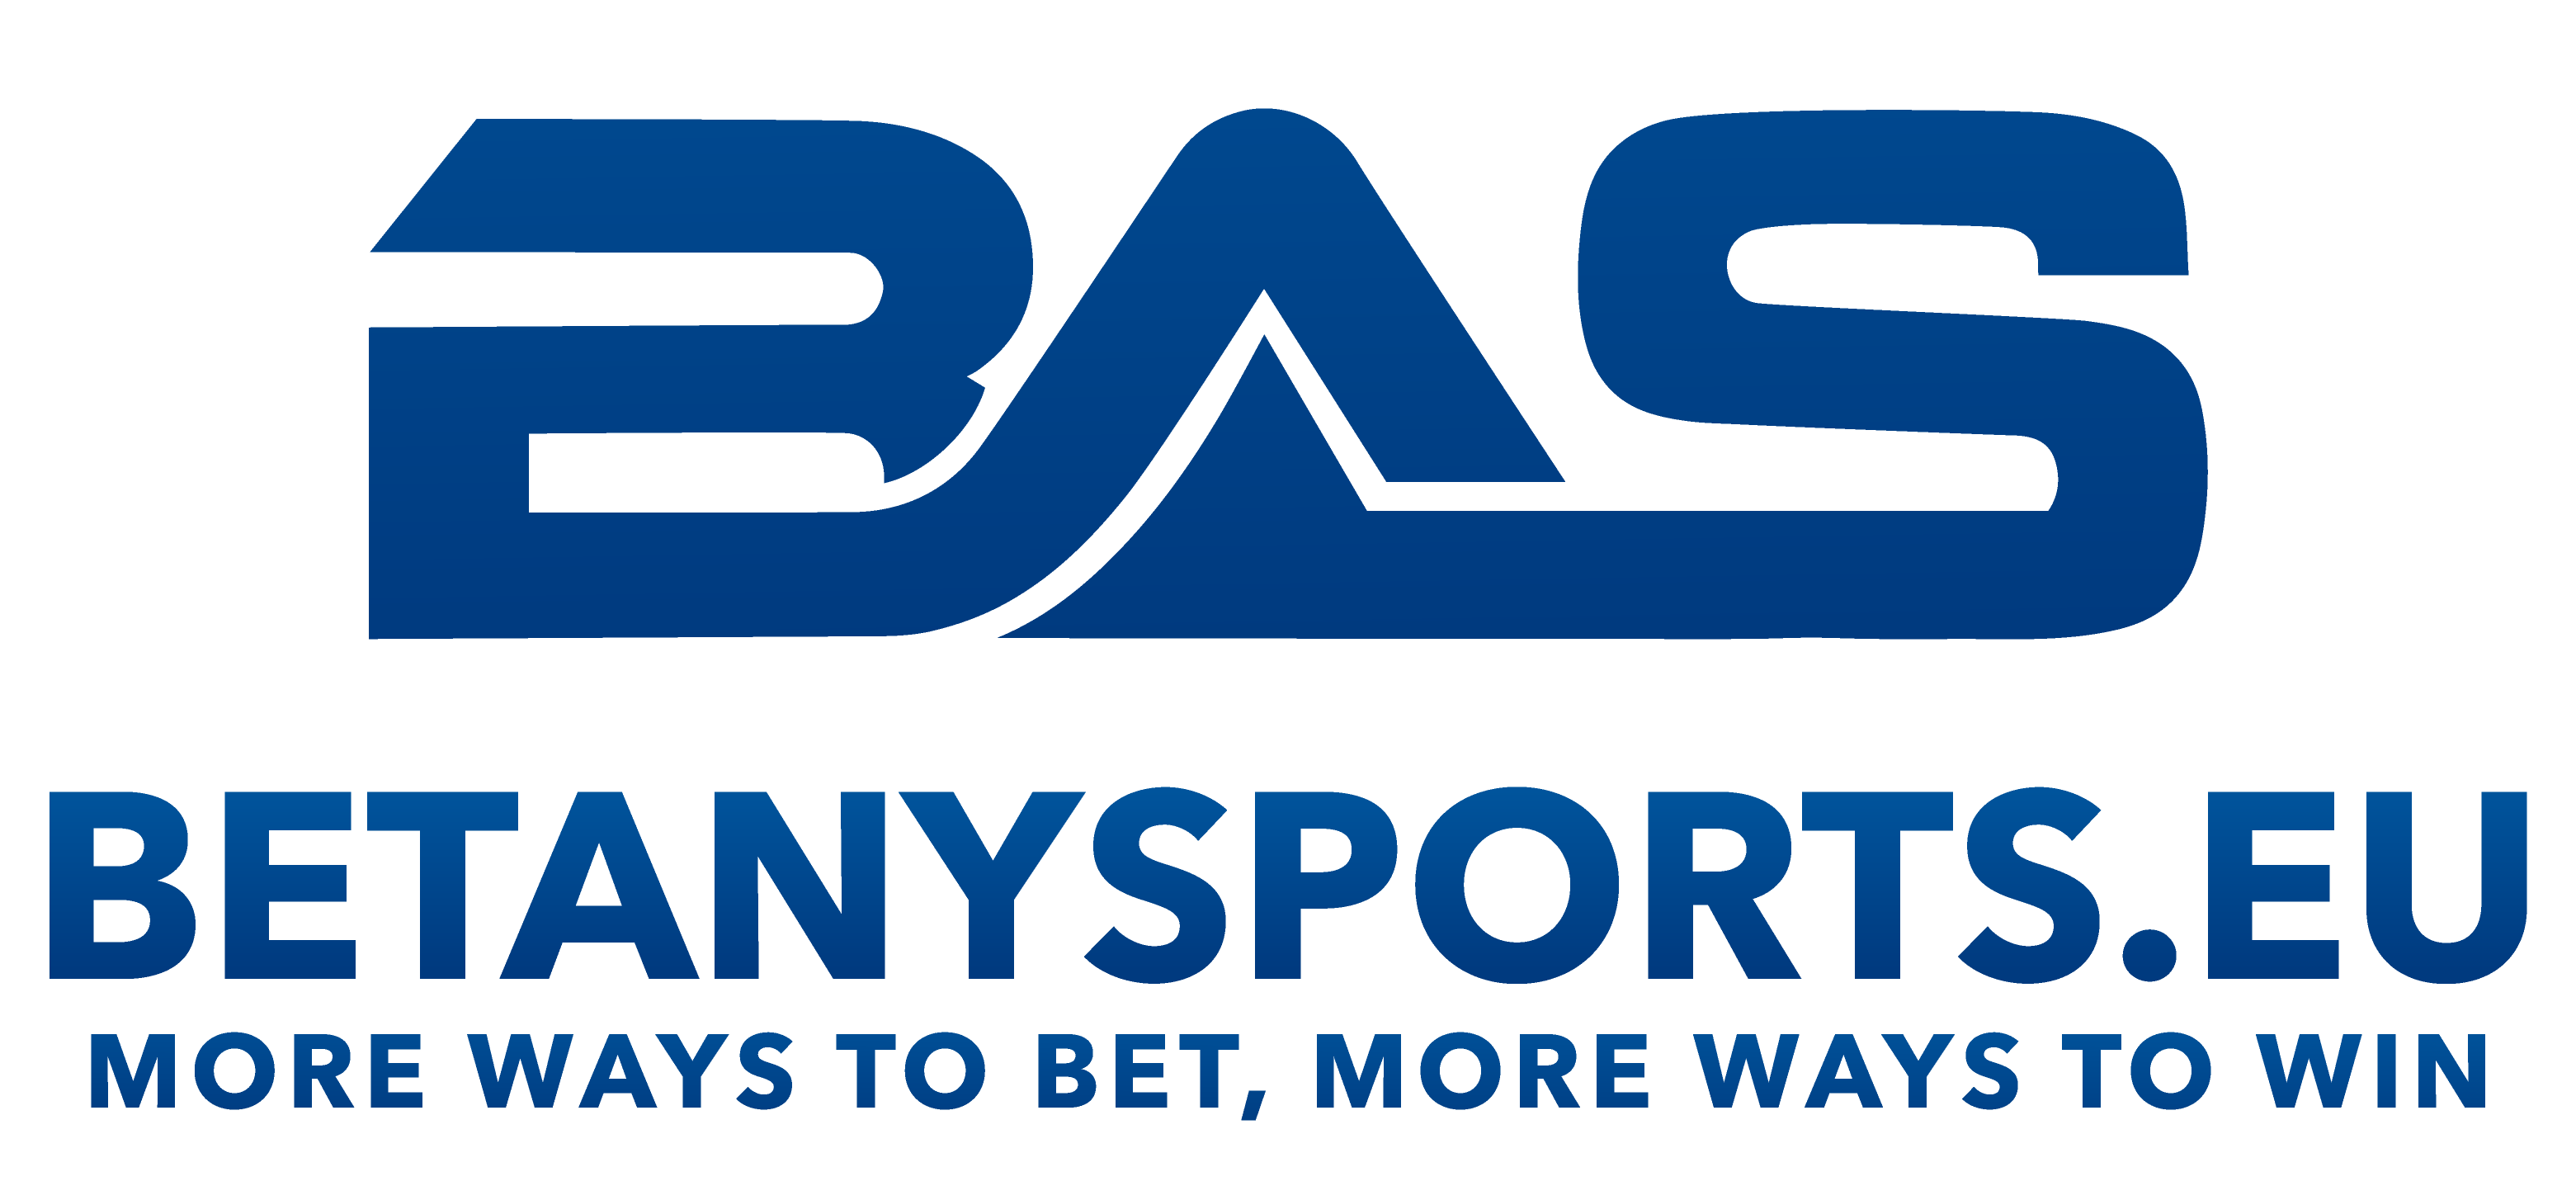 #4 BetAnySports Sportsbook